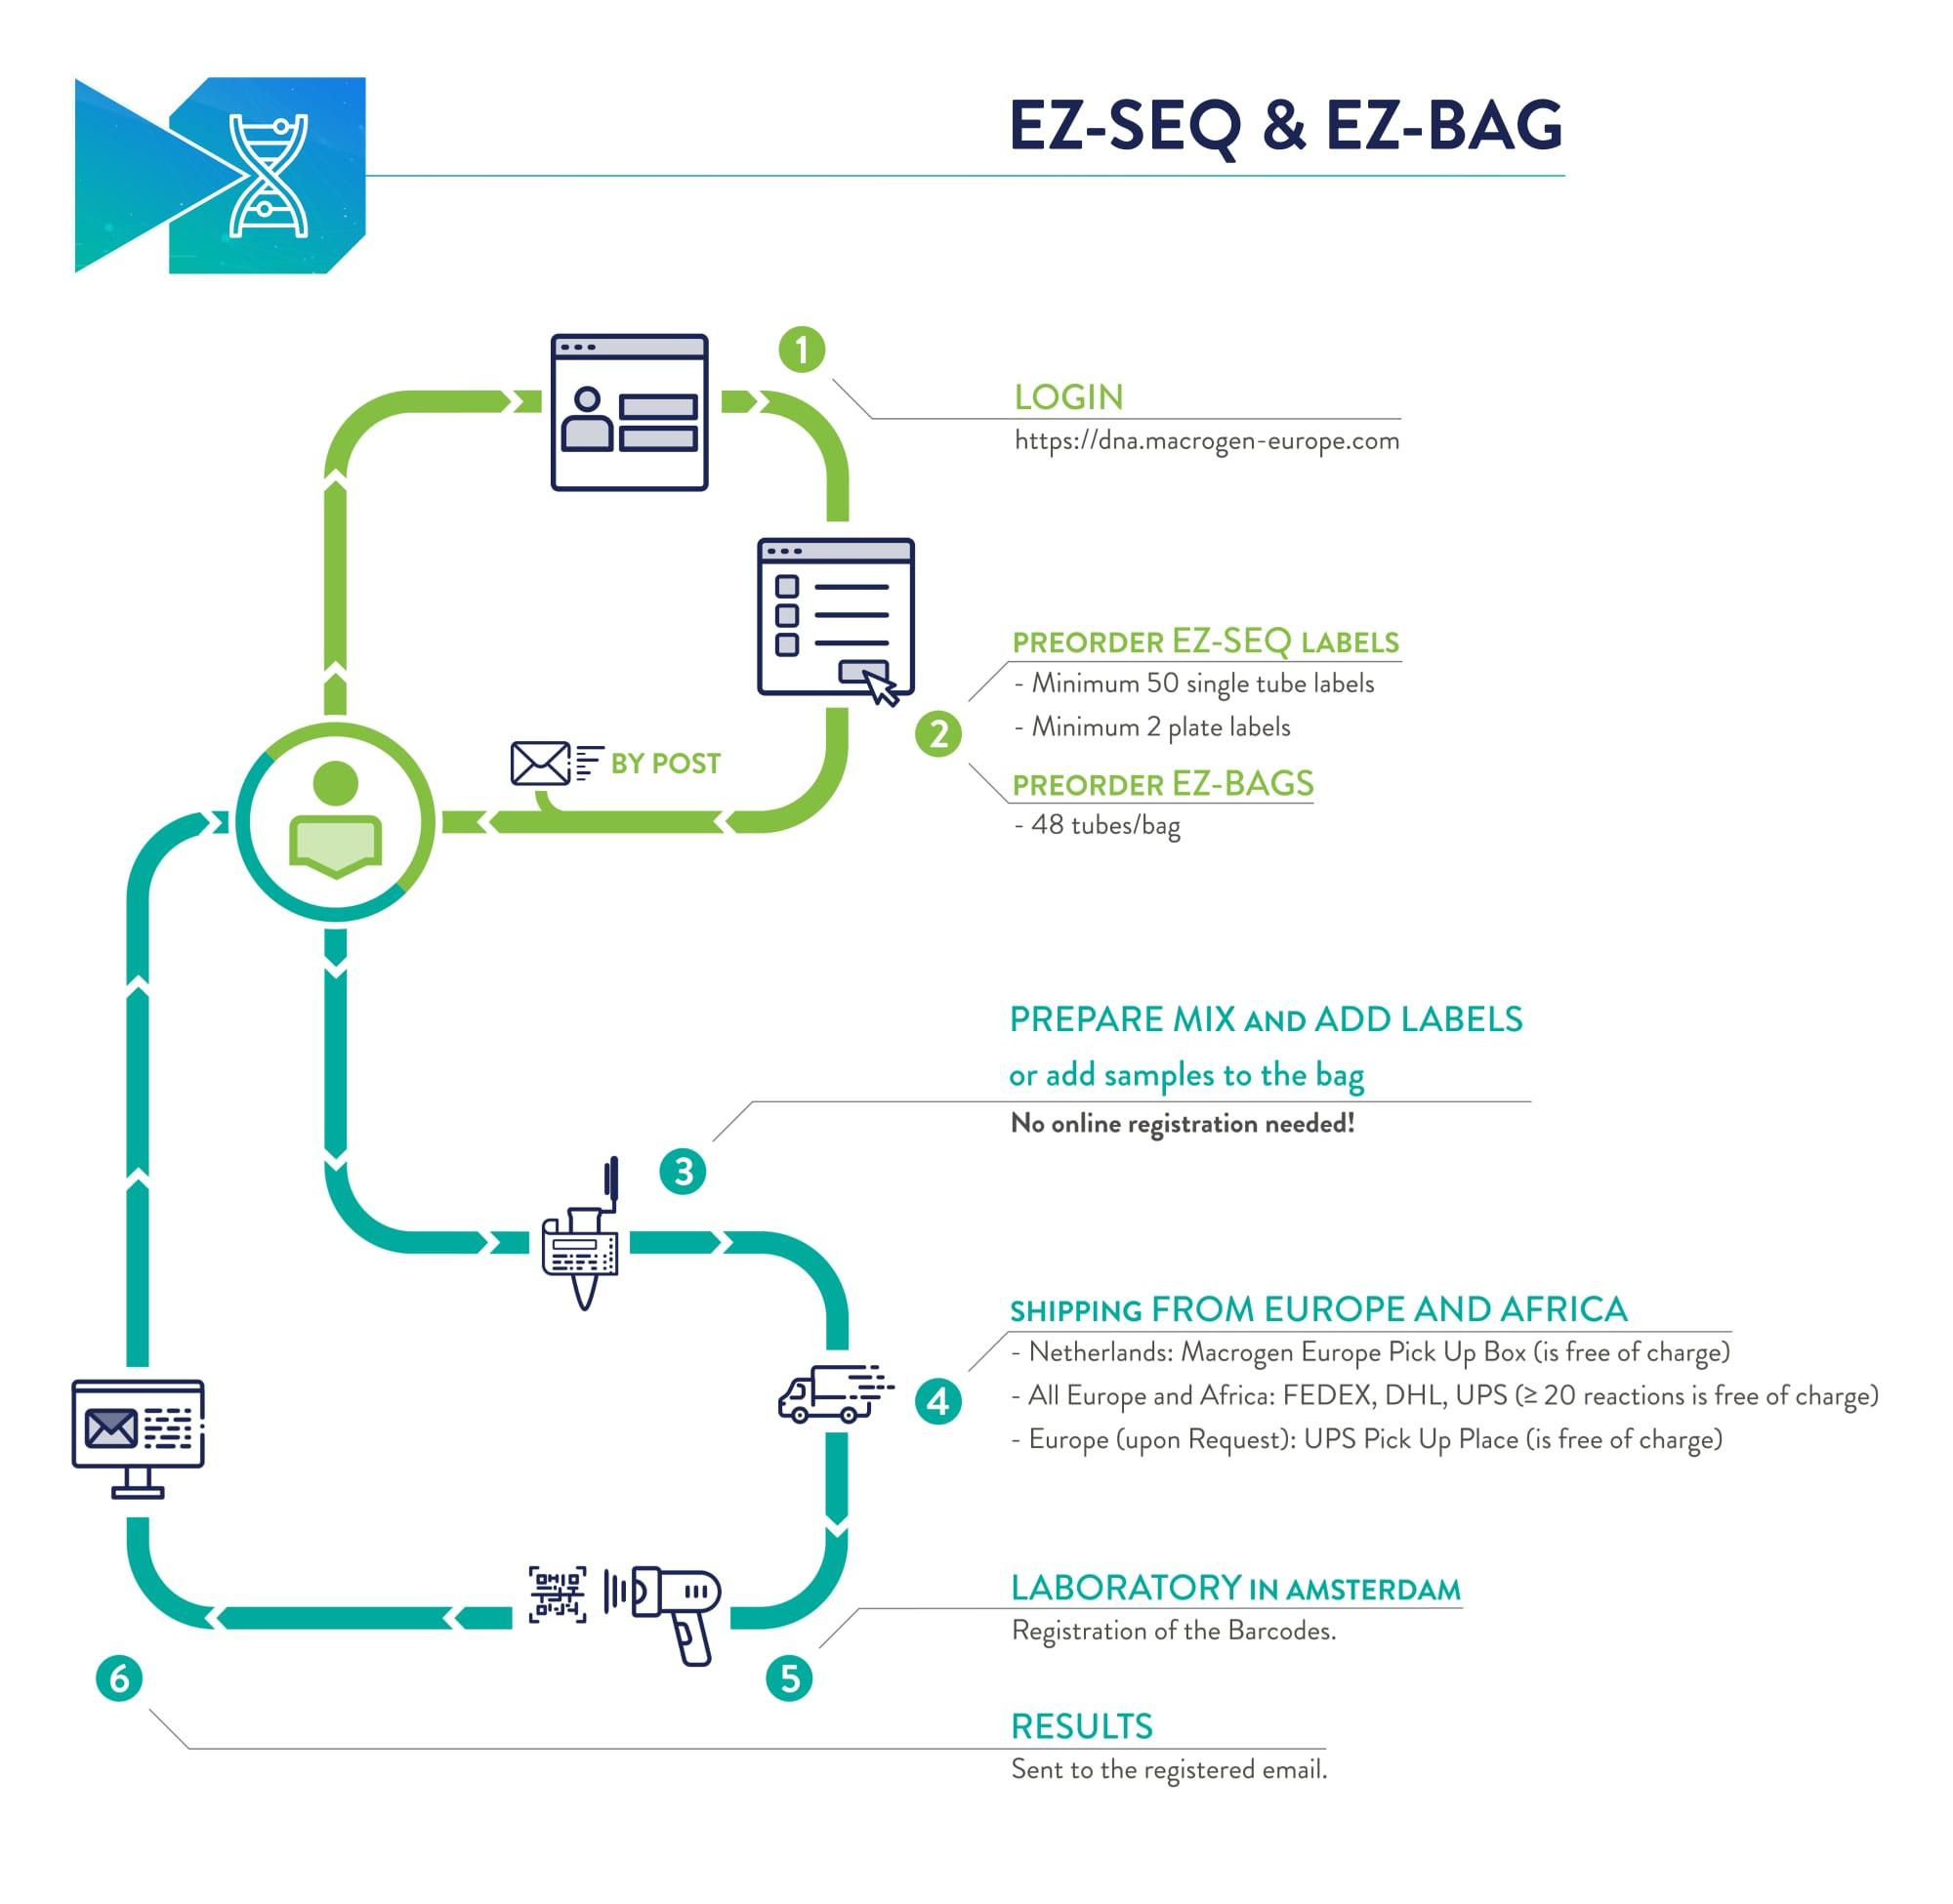 EZ-SEQ & EZ-BAG WORKFLOW.